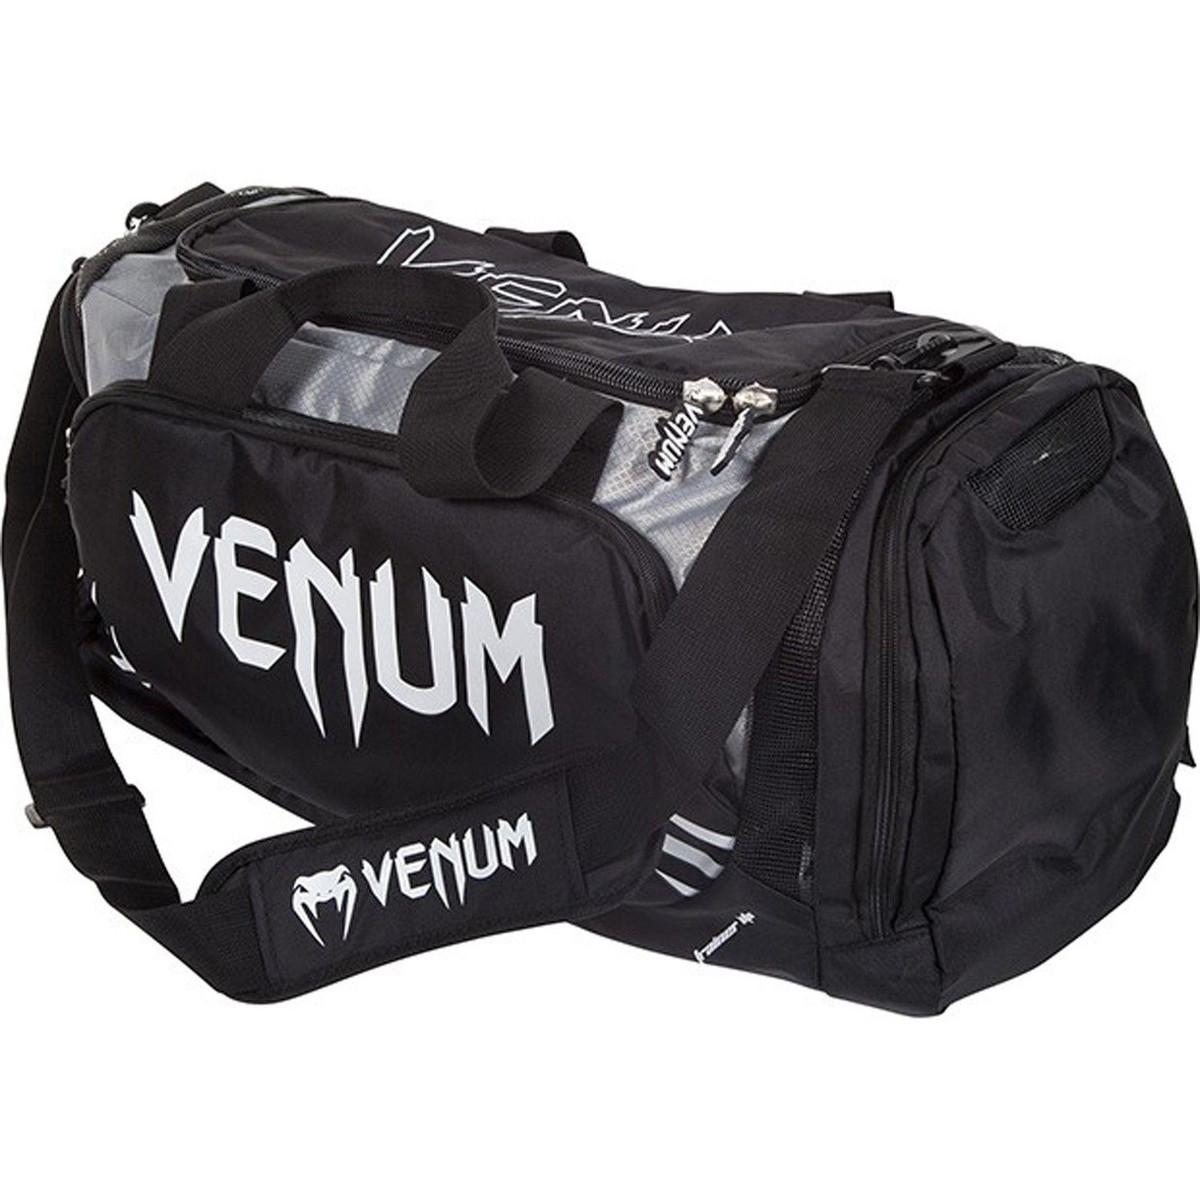 taška VENUM - Trainer Lite Sport - Black/Grey - Venum-1011